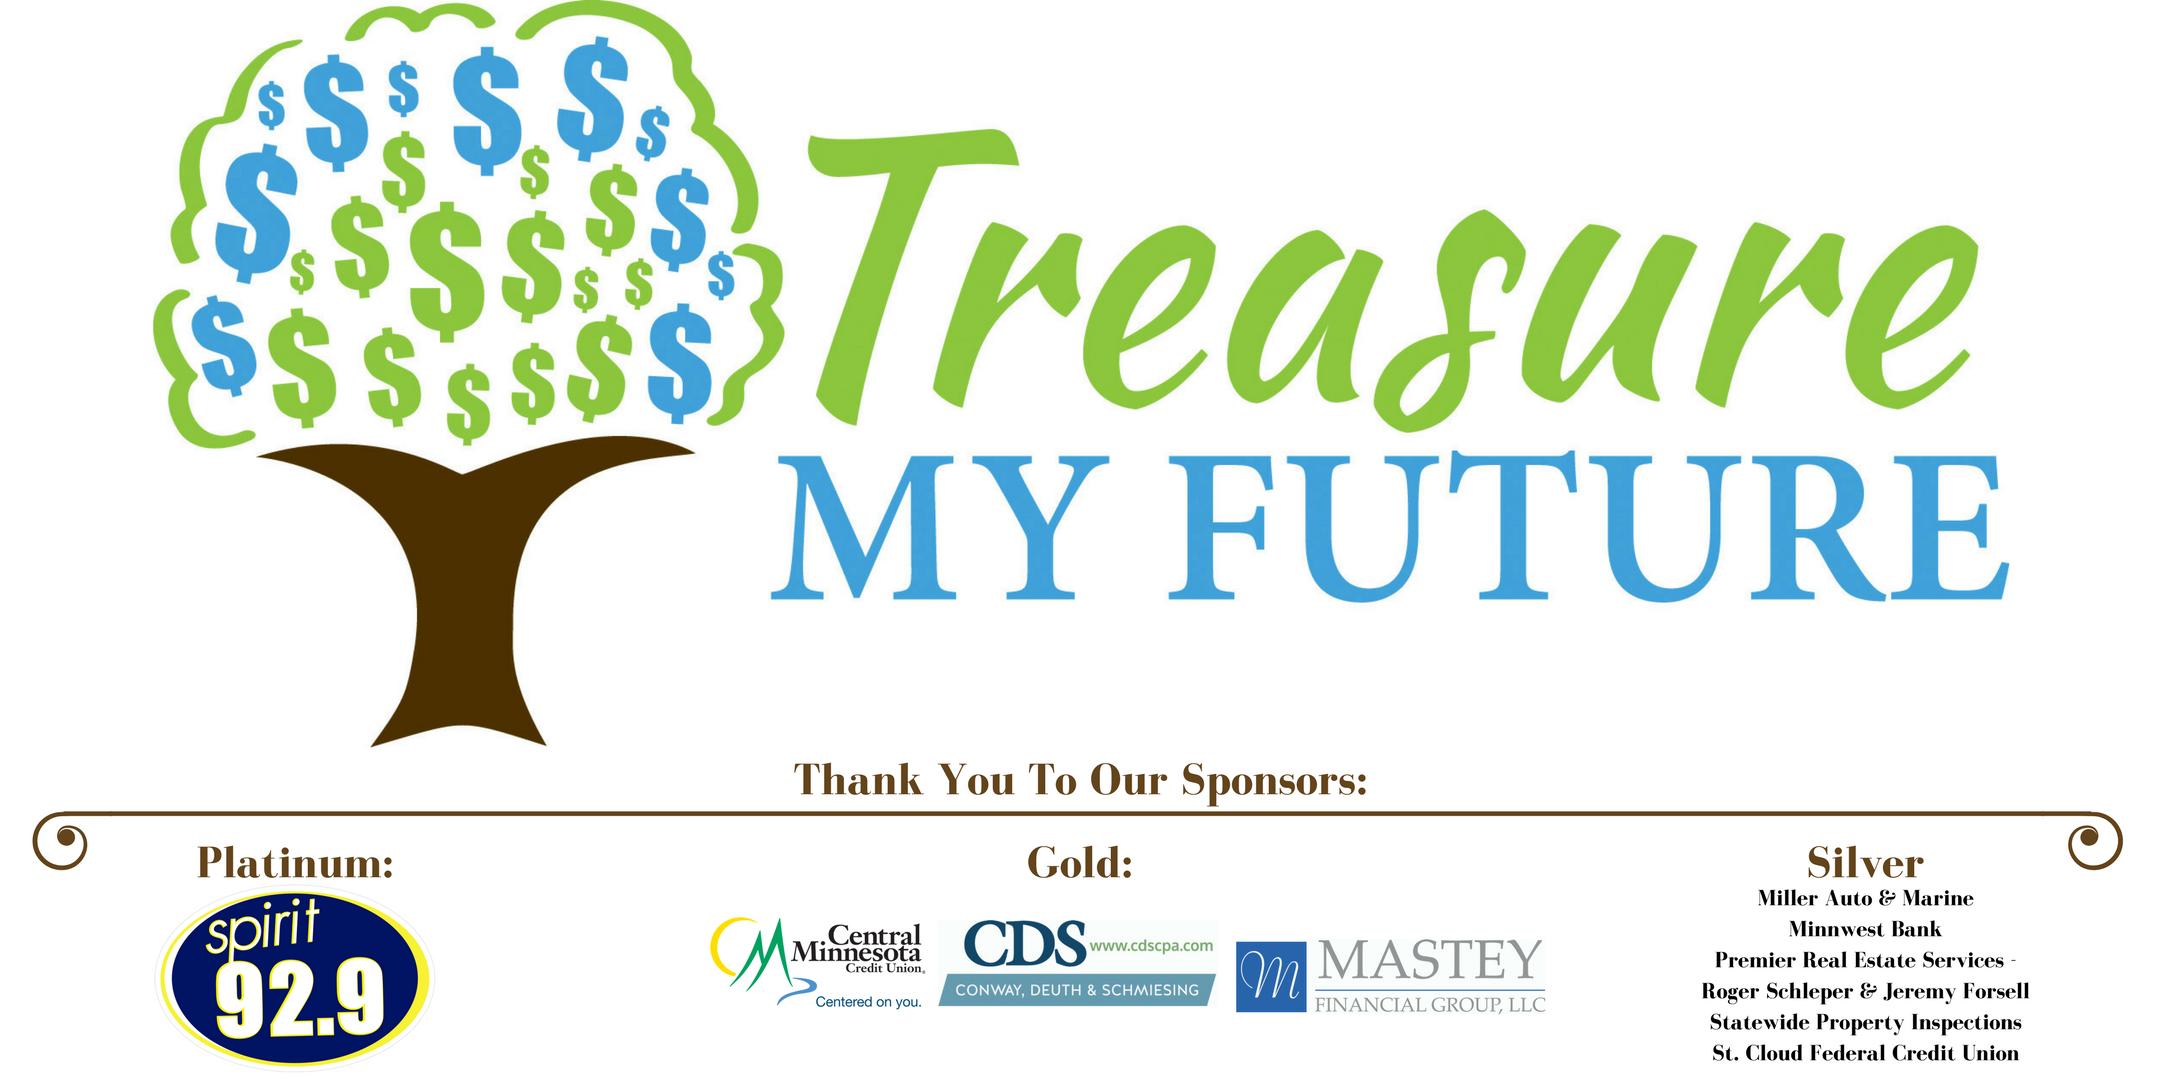 2018 Treasure My Future Financial & Life Skil